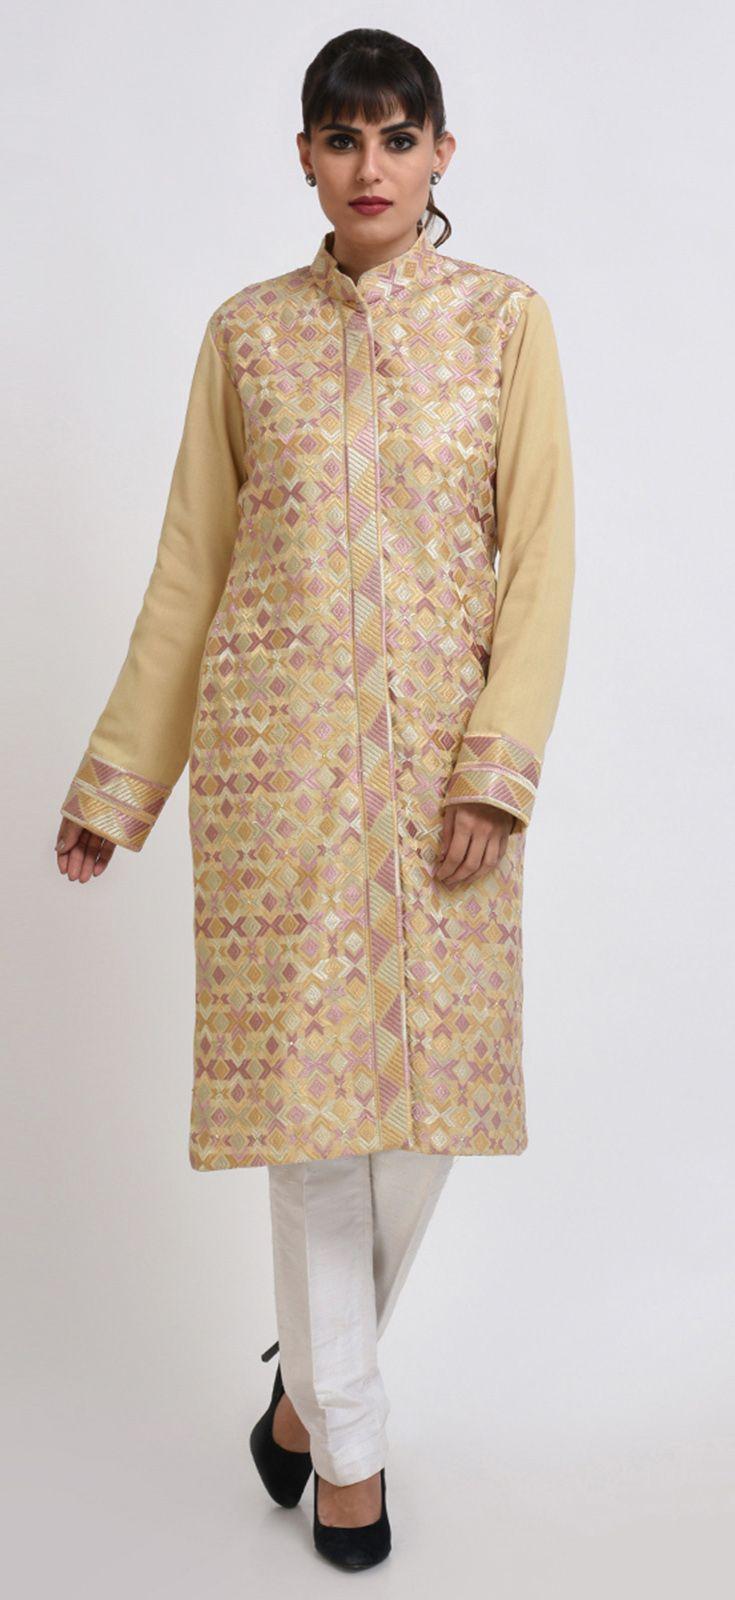 46e63460b5 Beige Gold Phulkari Embroidered Cotton-Wool Jacket | Eid 2018 ...